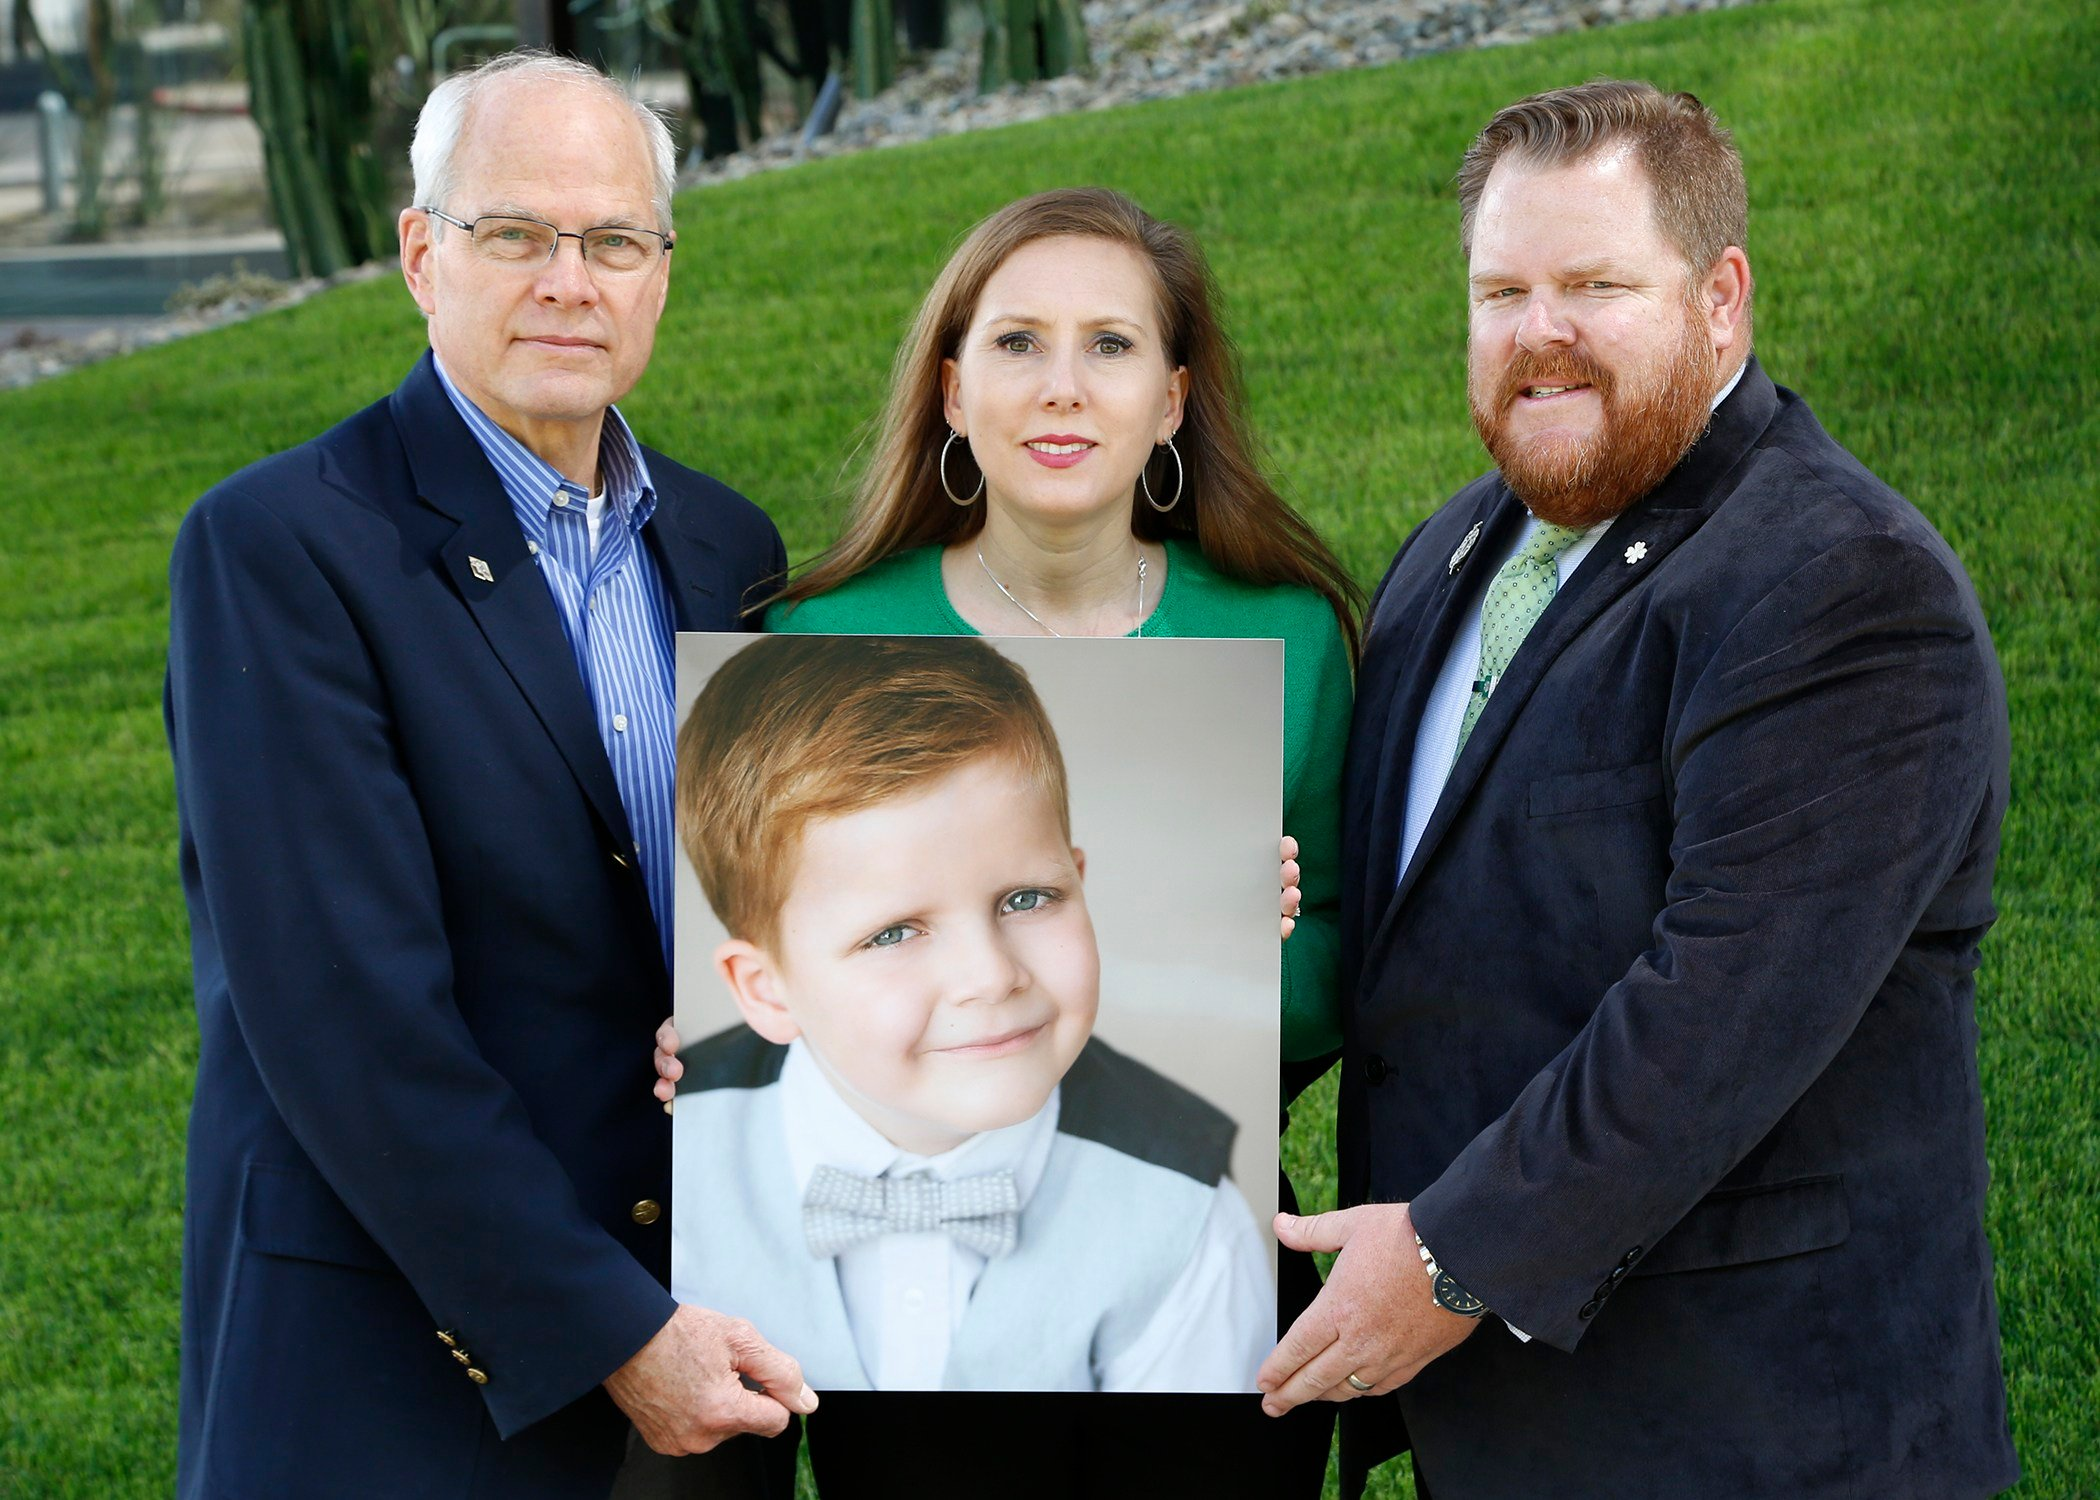 TGen Dep. Director Michael Berens with Shawnee and Shane Doherty holding Hollis' photo. (Source: Hope Through Hollis at TGen)